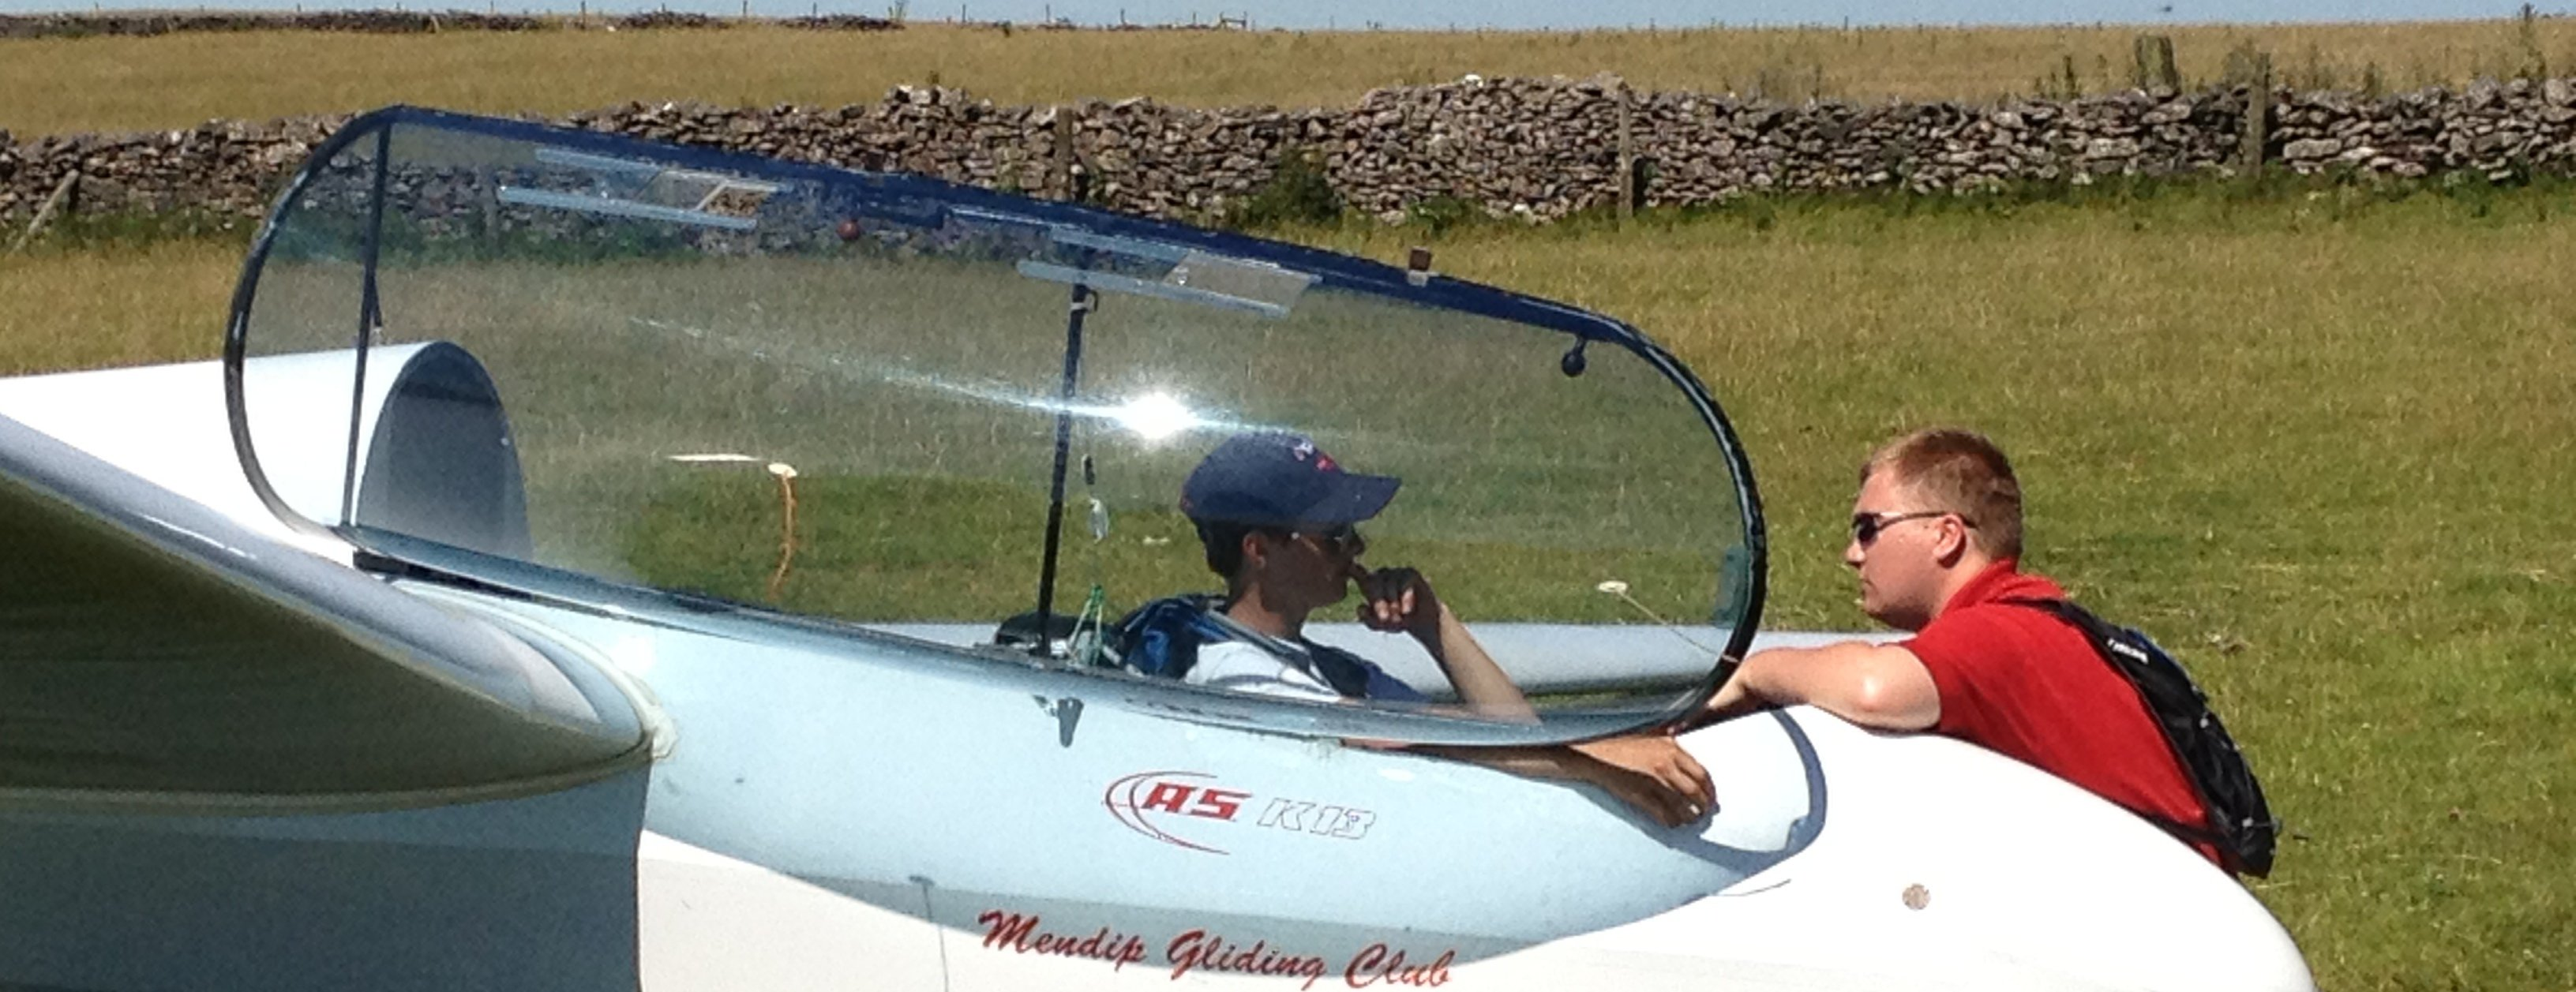 Mendip Gliding ASK13